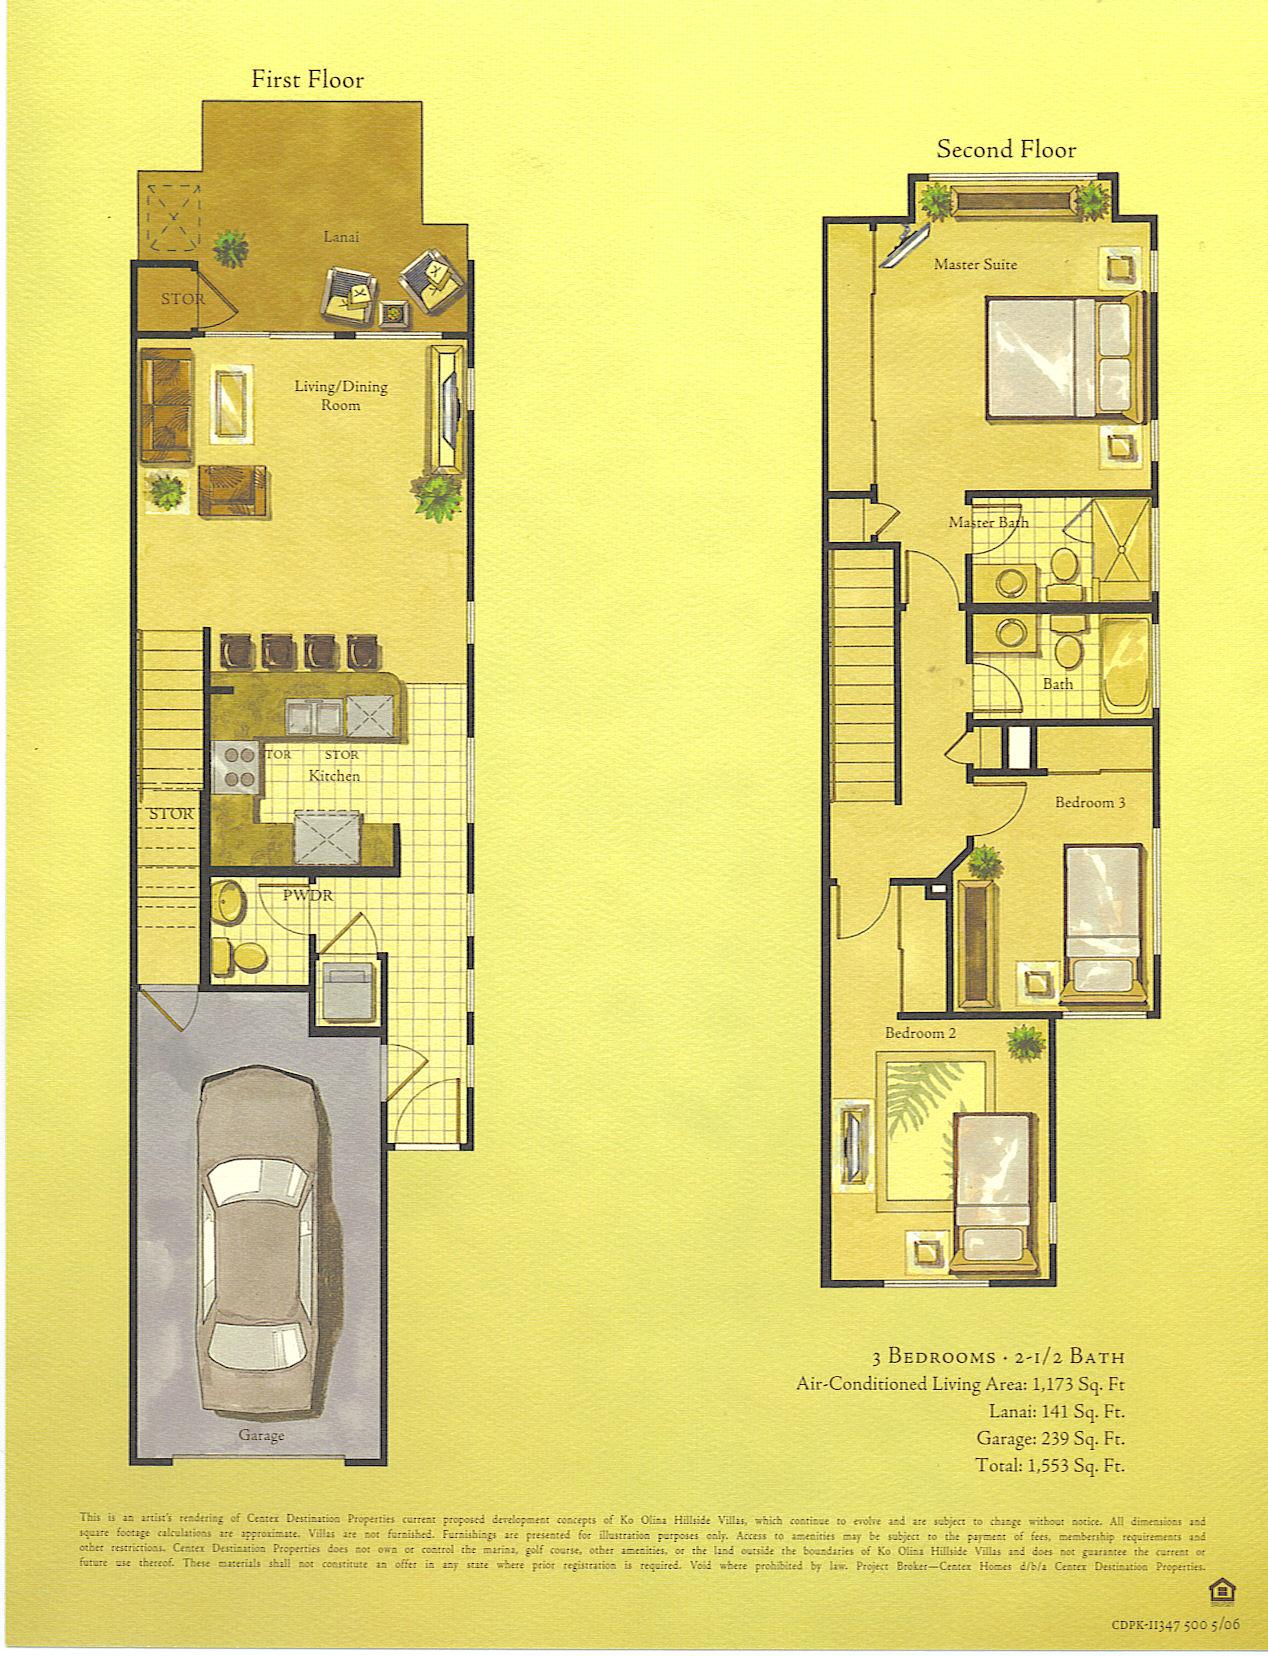 Living area - 1,173 sq. ft. Lanai - 141 sq. ft. Garage - 239 sq. ft. Total - 1,553 sq. ft.